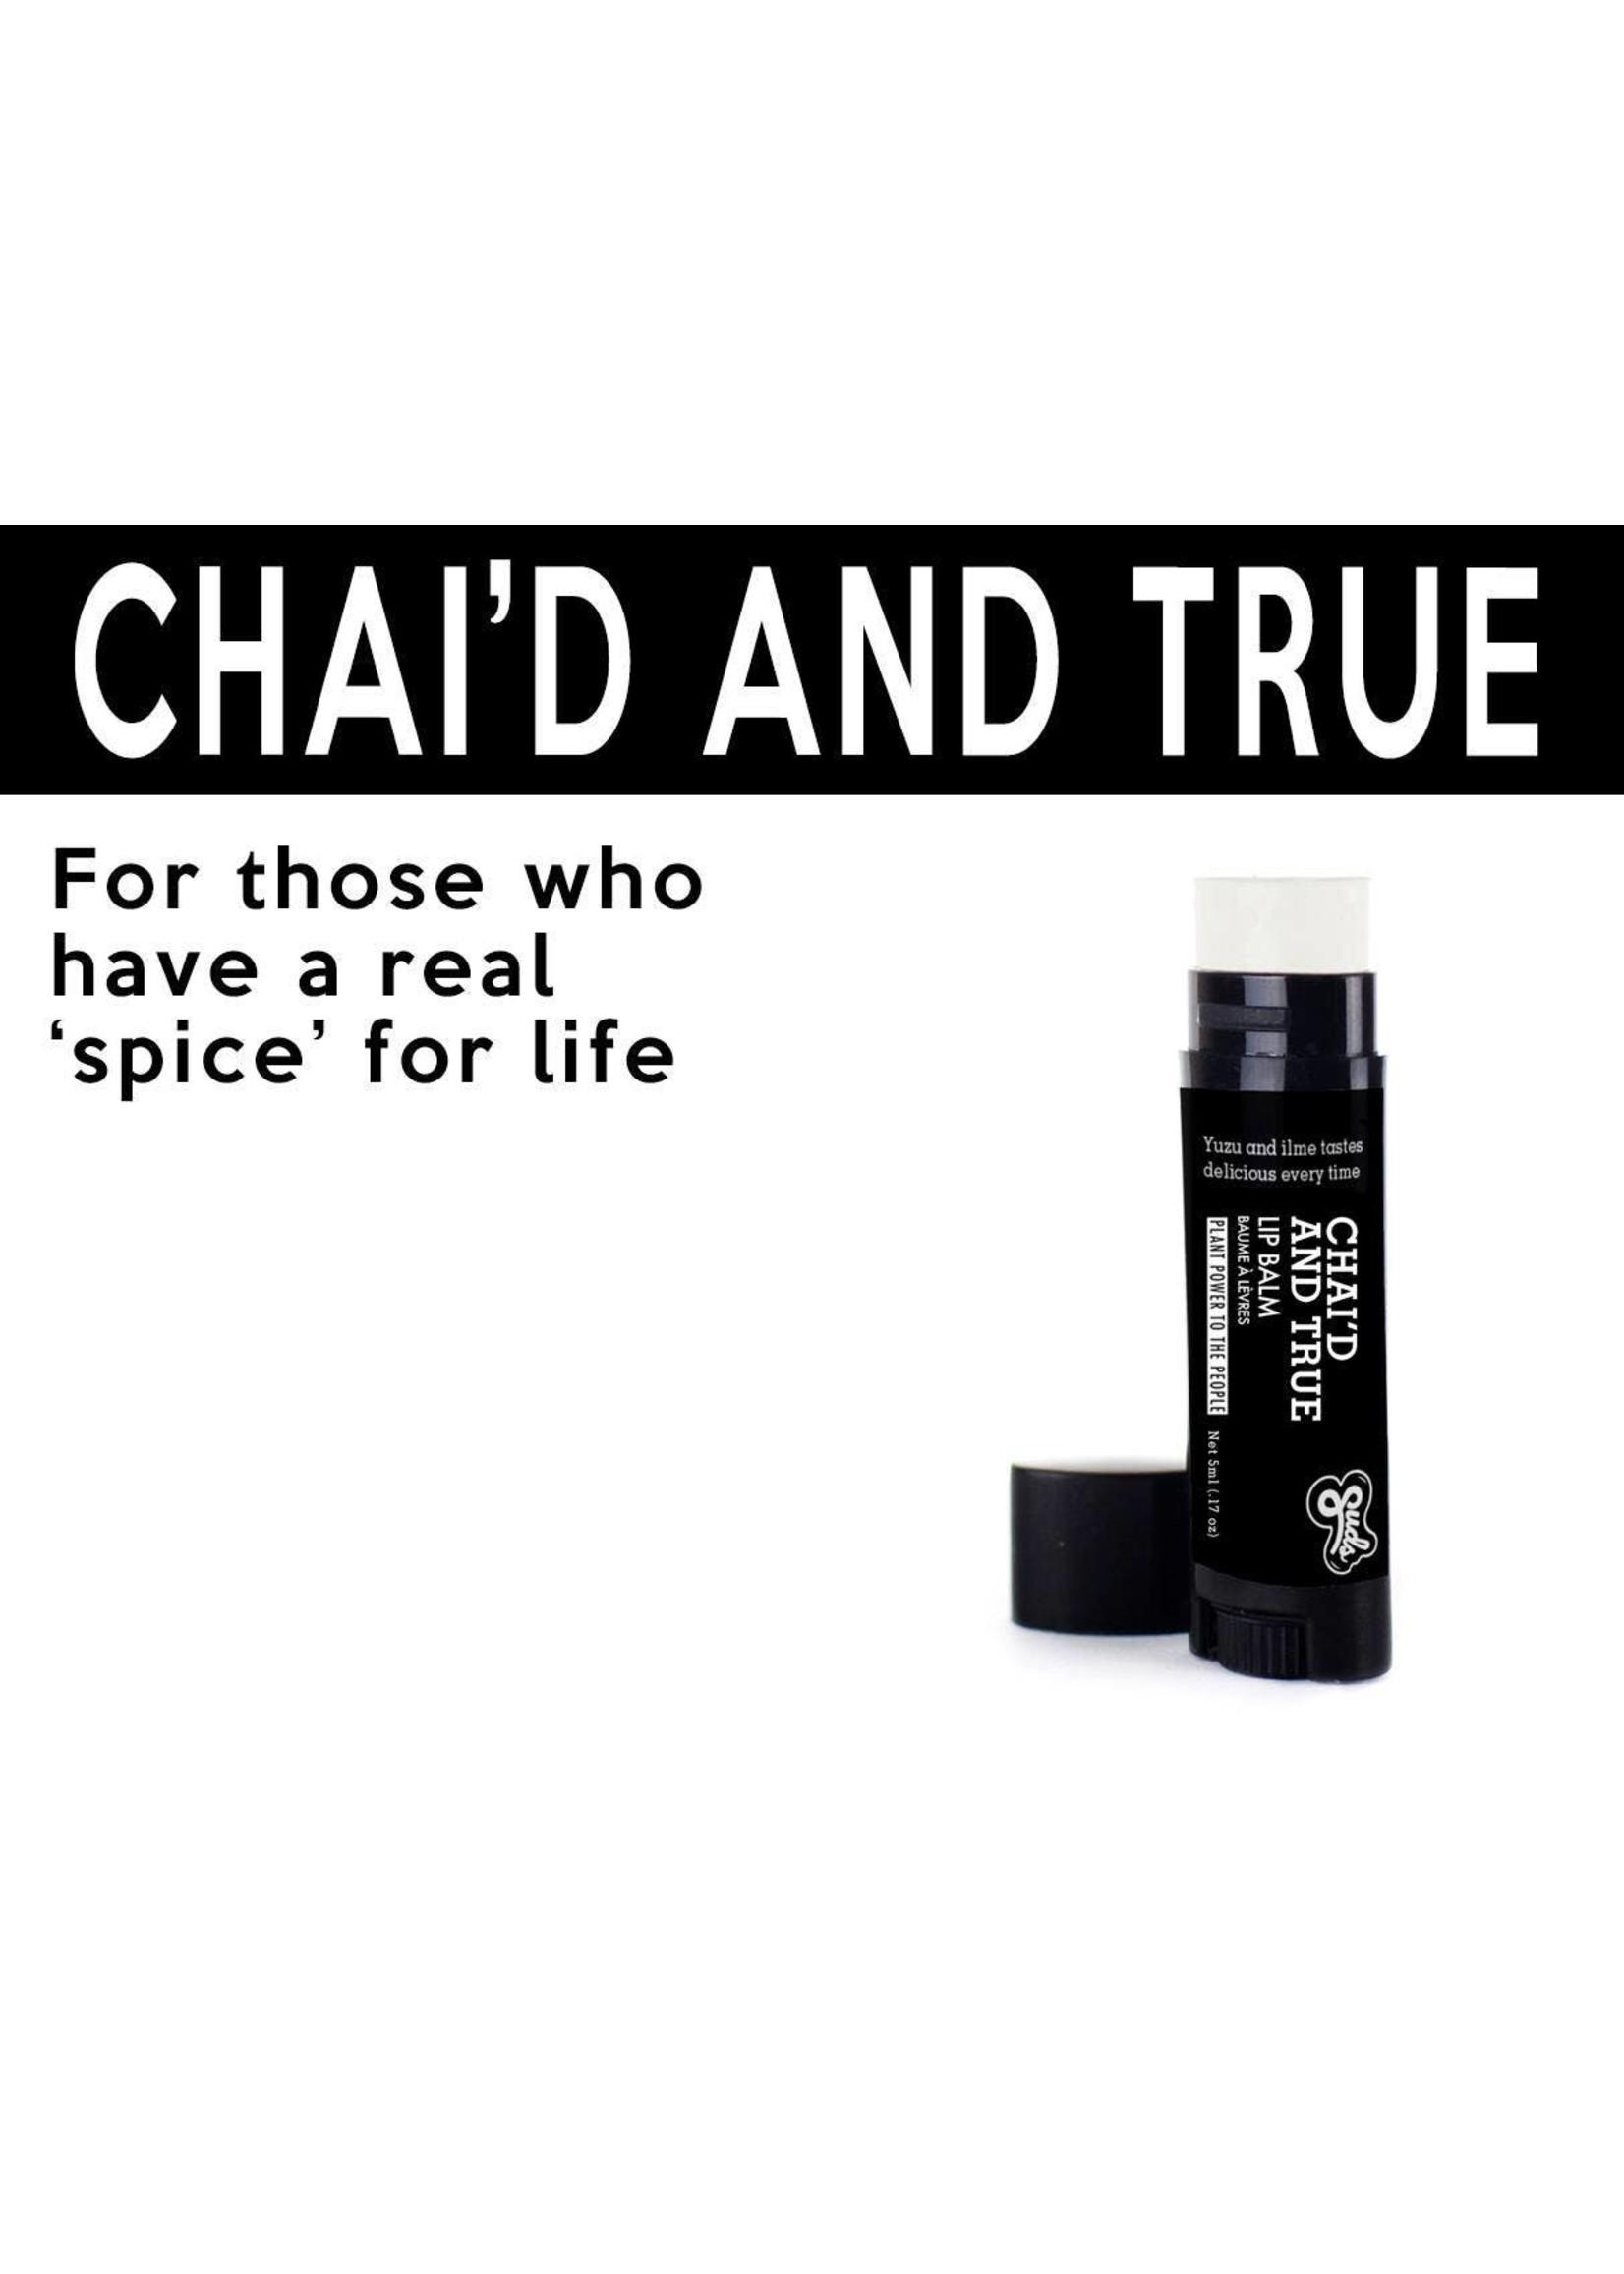 Sudsatorium Chai'd and True Lip Balm